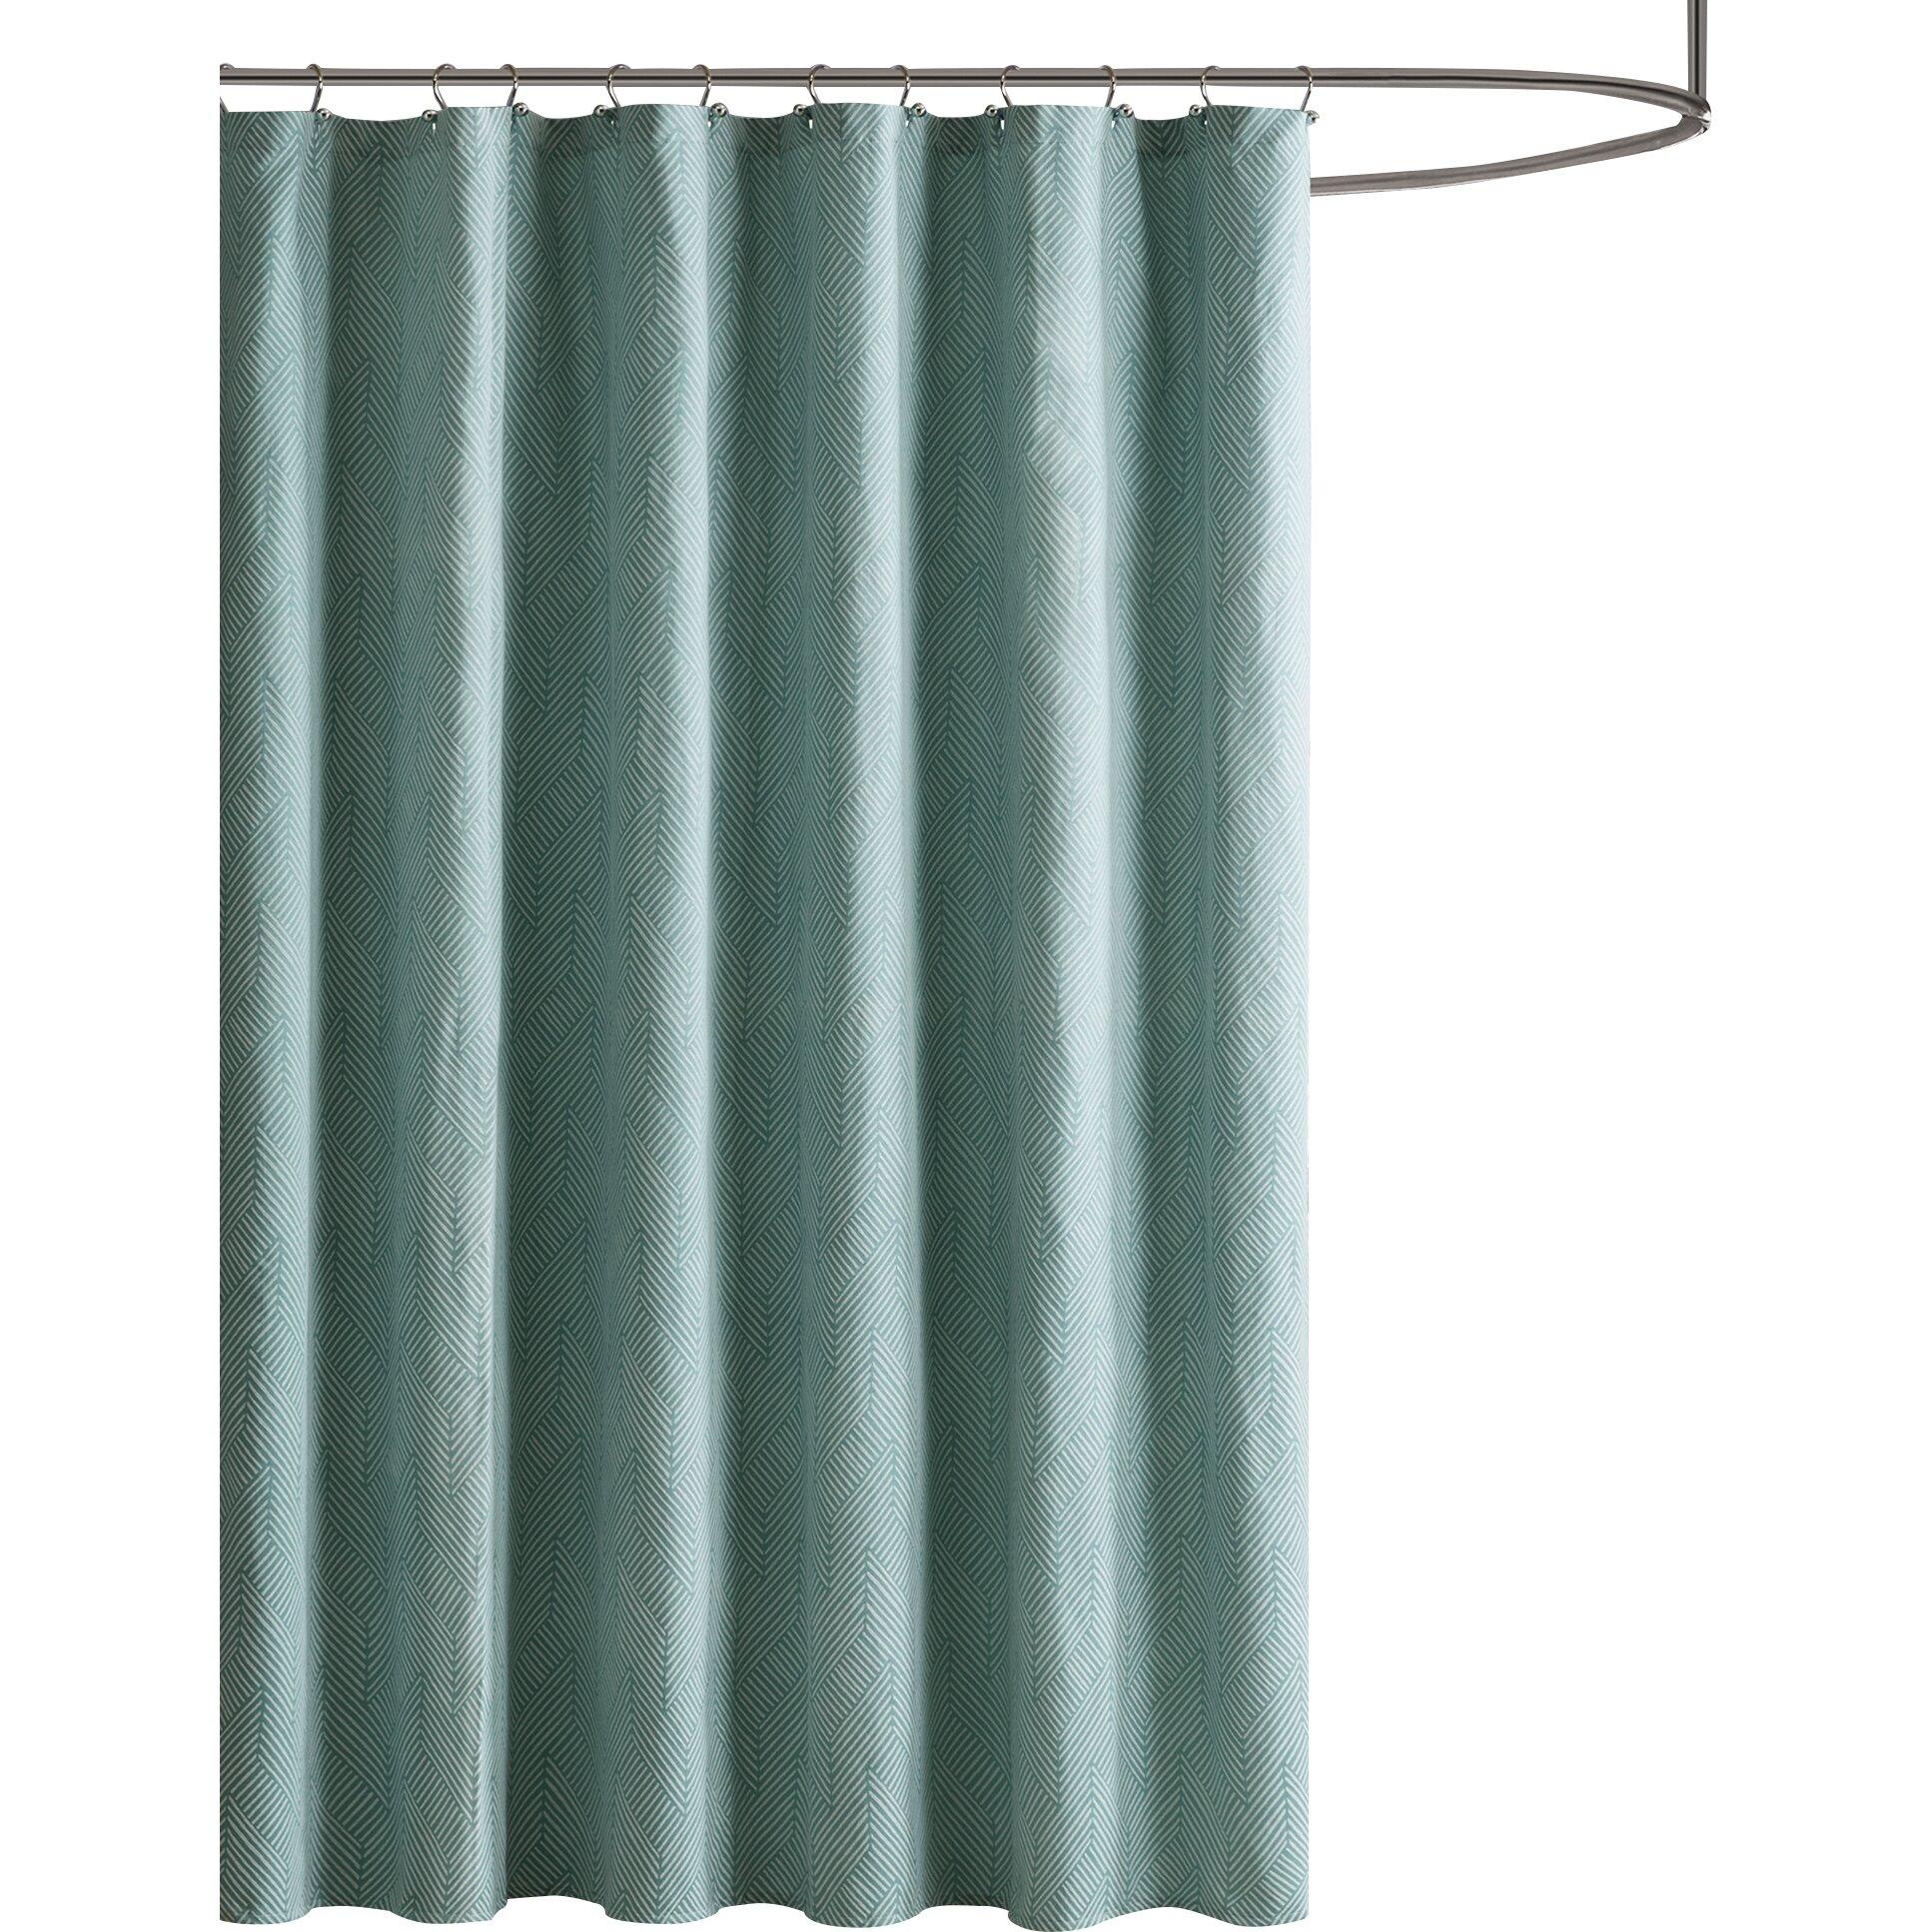 Aqua Chevron Shower Curtain - Ambrose chevron jacquard shower curtain